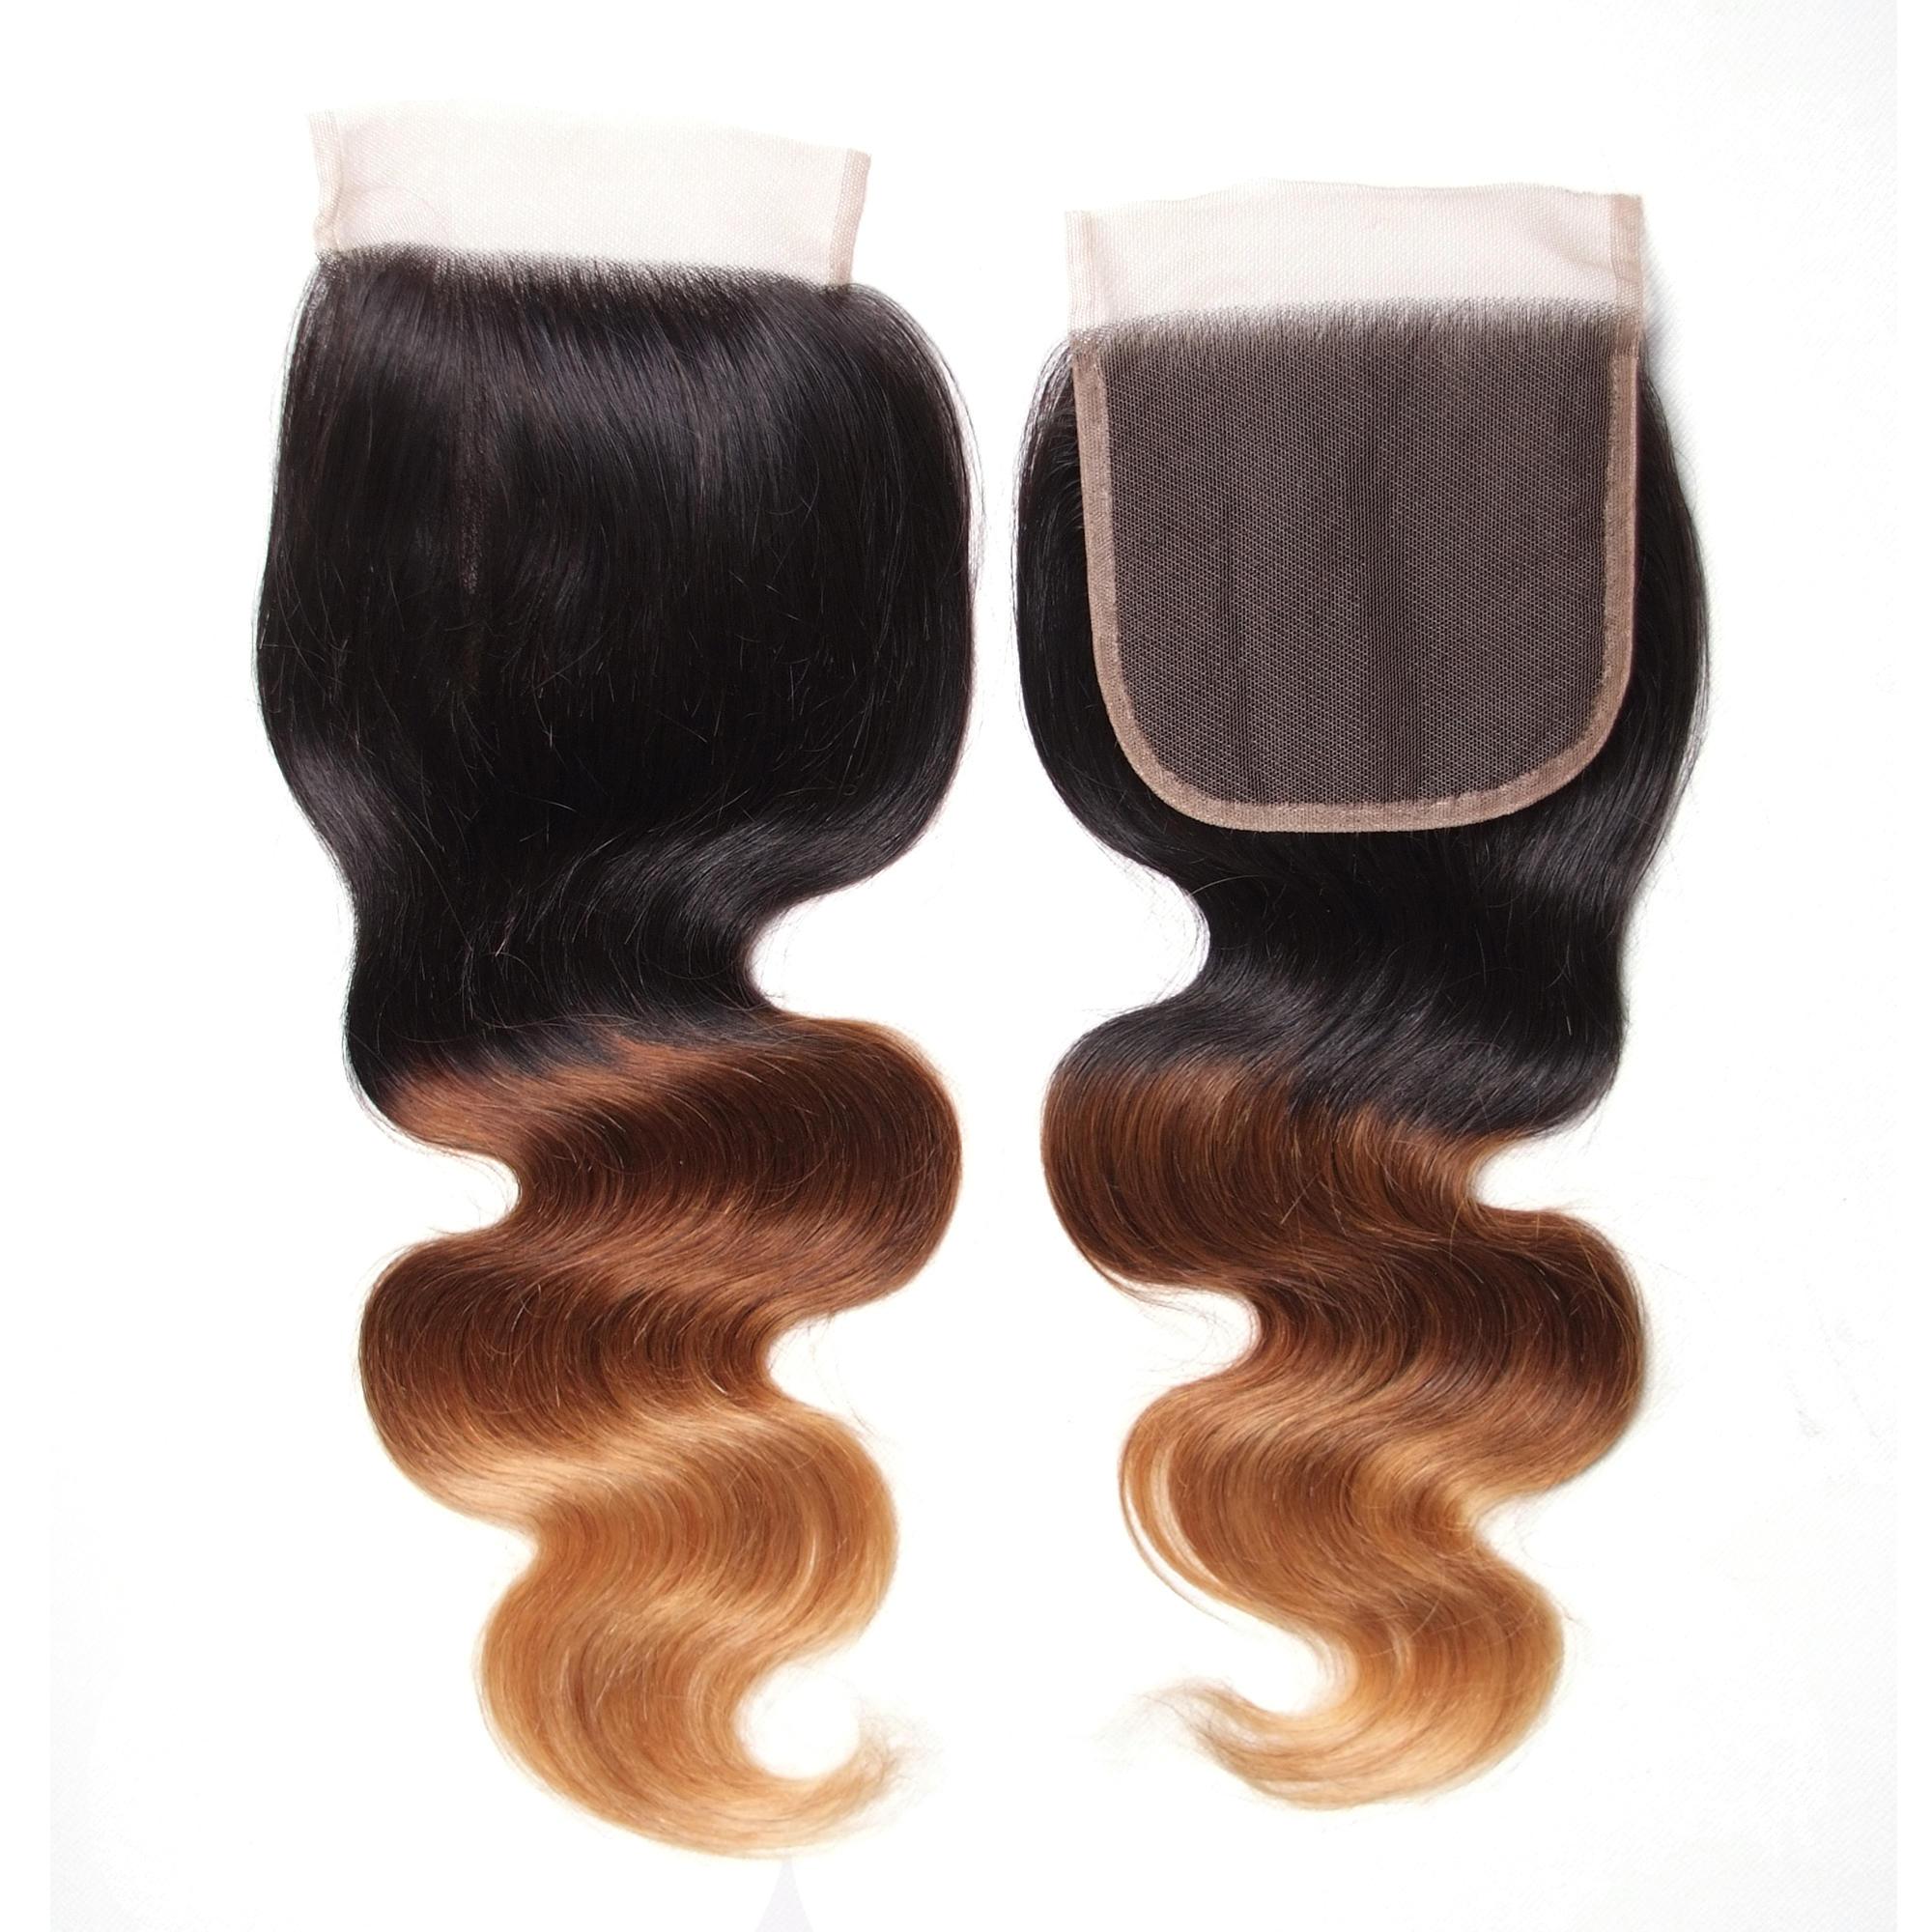 UNice Hair image 16